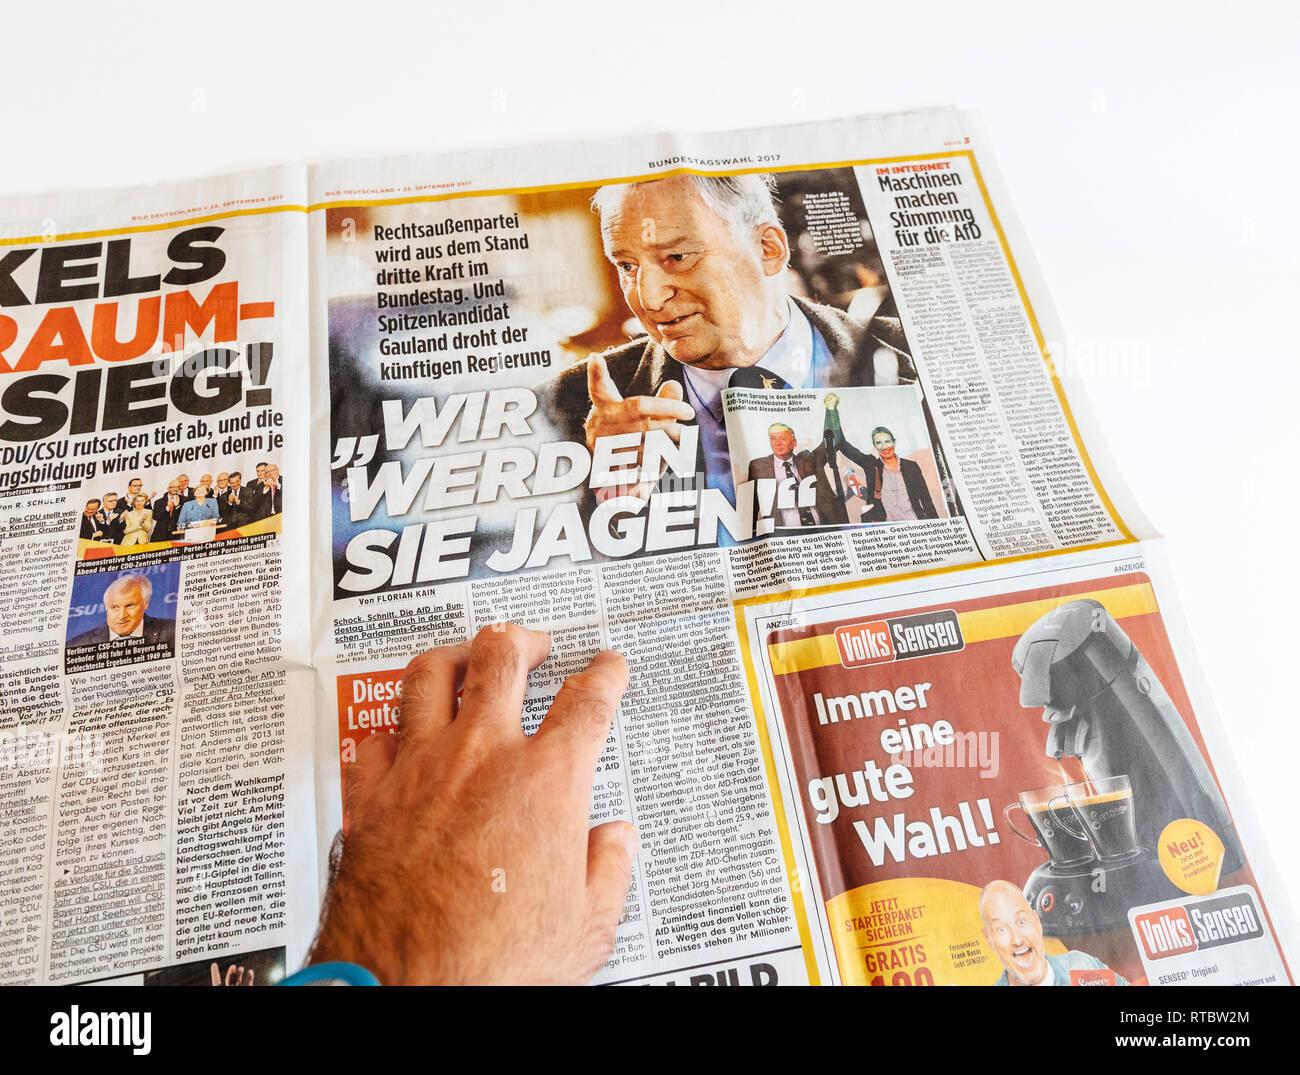 PARIS, FRANCE - SEP 25, 2017: Man reading French Die Bild  with Jorg Meuthen, Alice Weldel, Alexander Gauland photos from Alternative fur Deutschland political party newspaper election Germany  - Stock Image